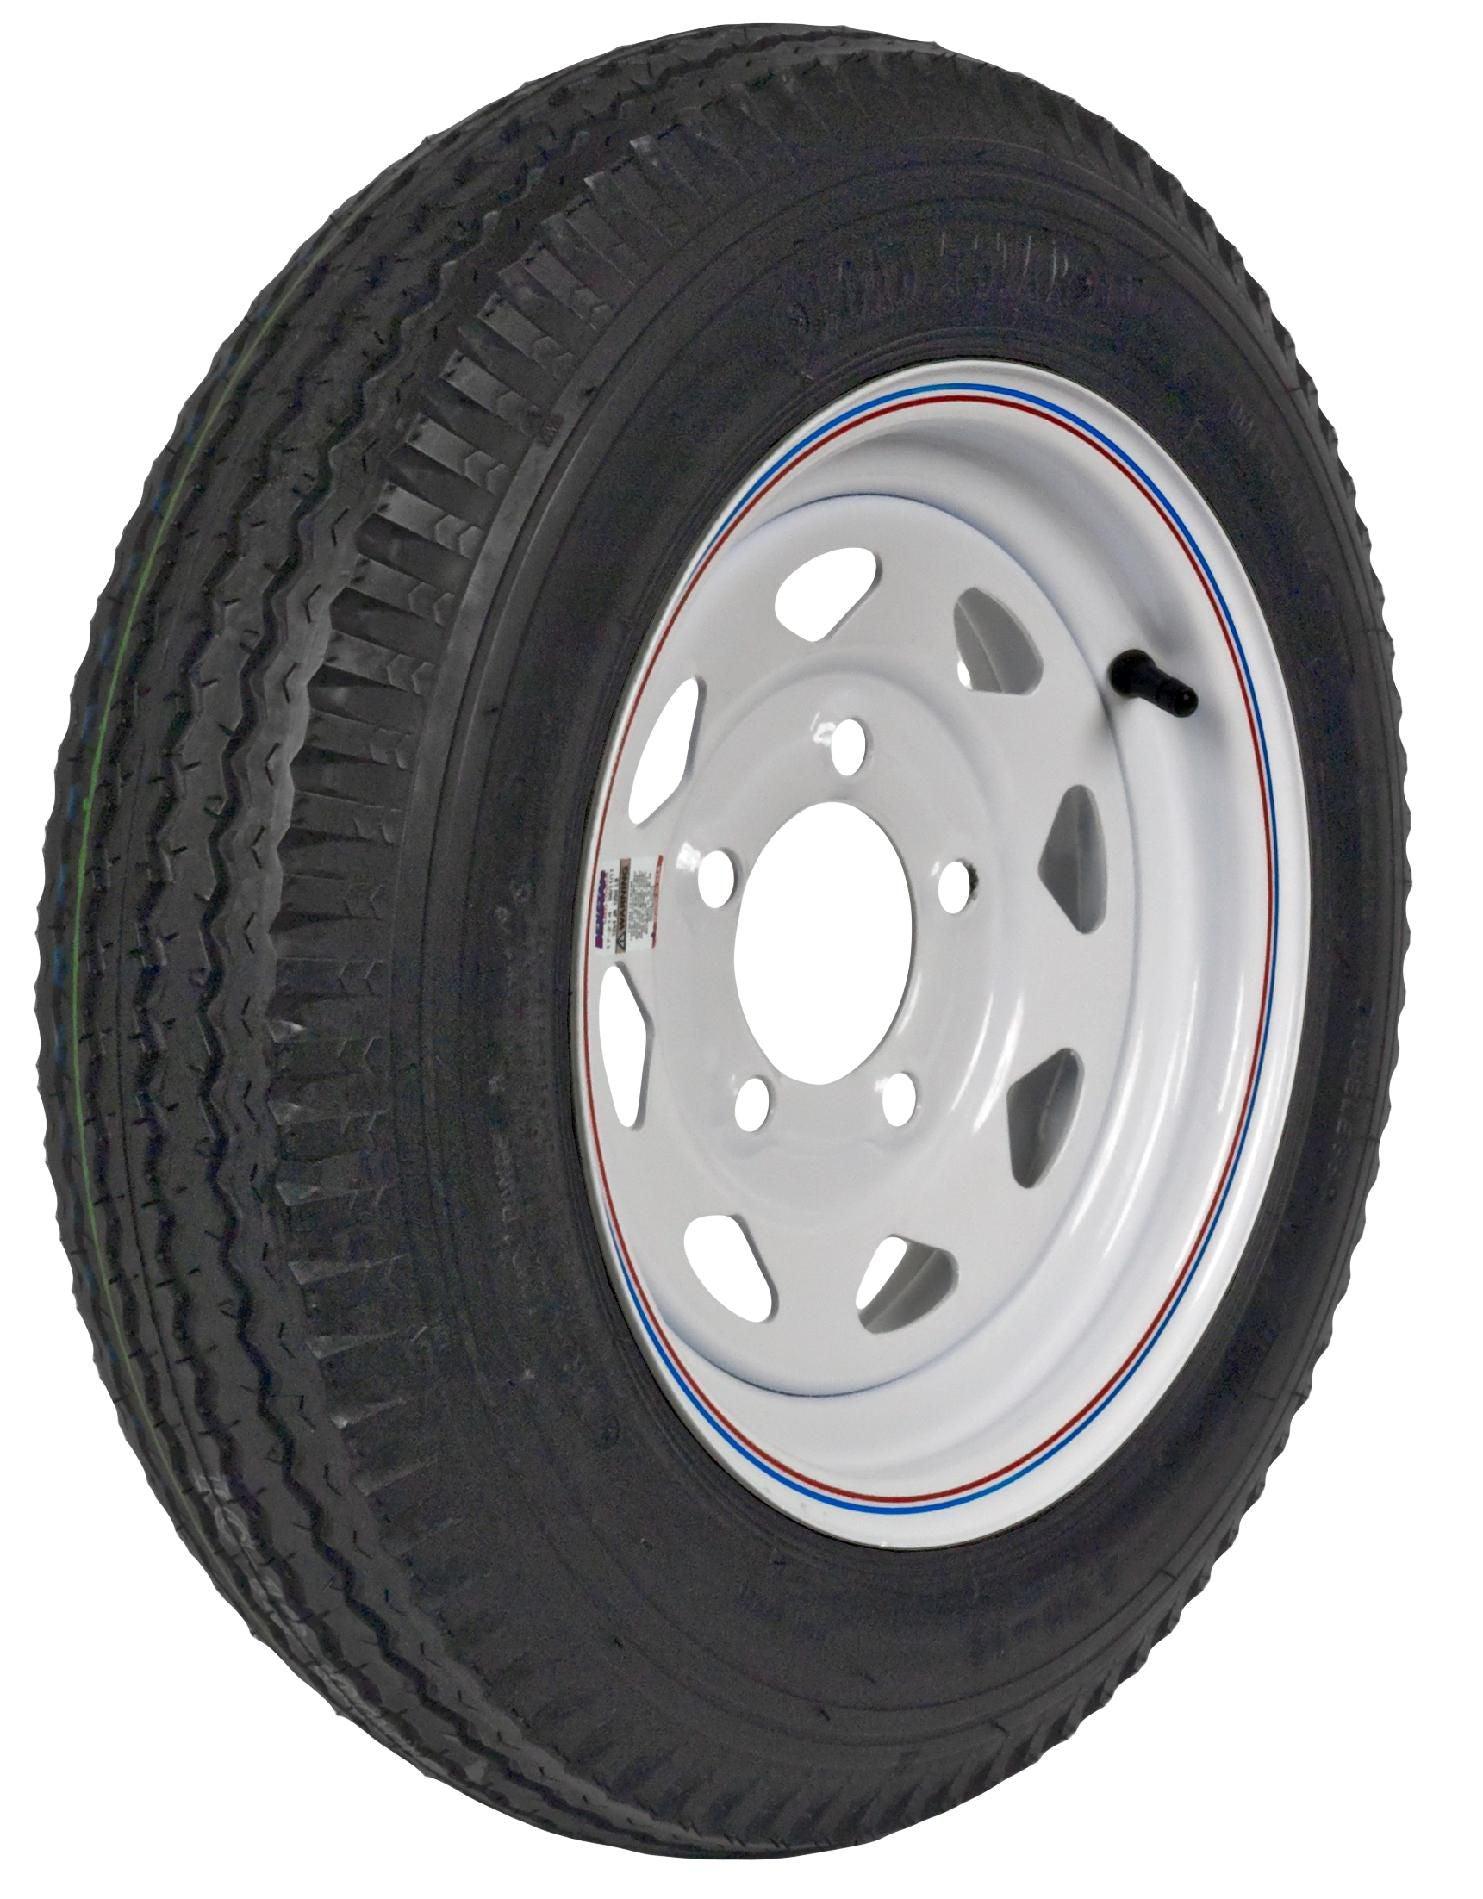 Martin Wheel Dm452c-5c-i Loadstar Bias Ply Trailer Tire, 530-12